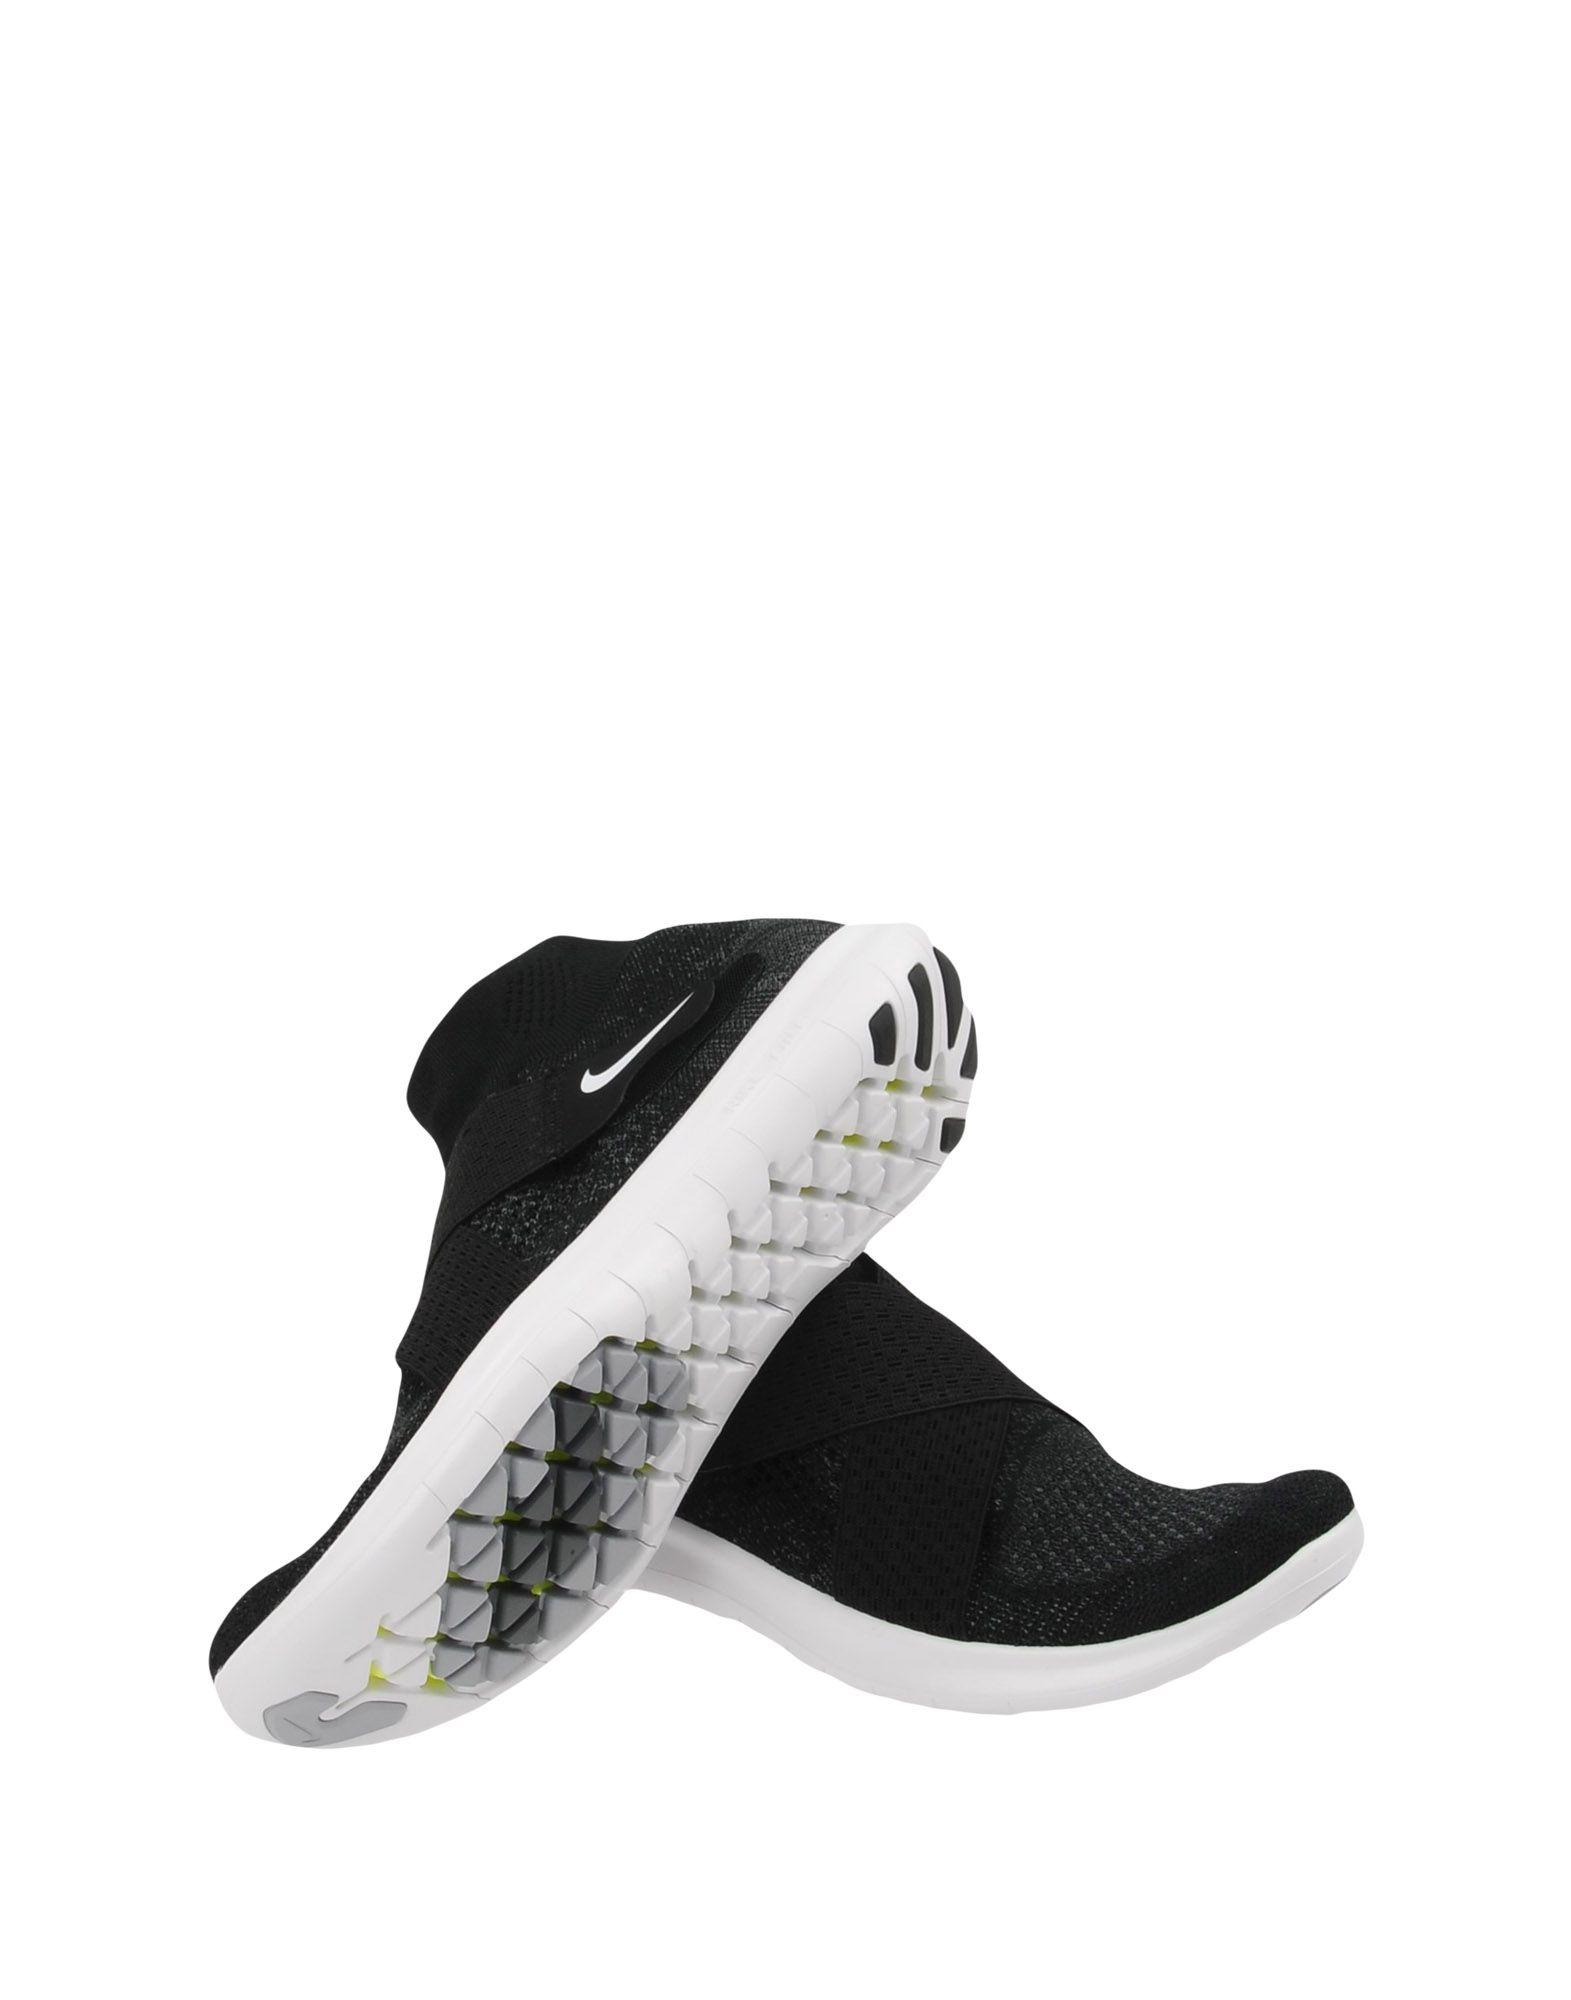 Nike   Free Run Motion Fk 2017  11431339VI 11431339VI  576321